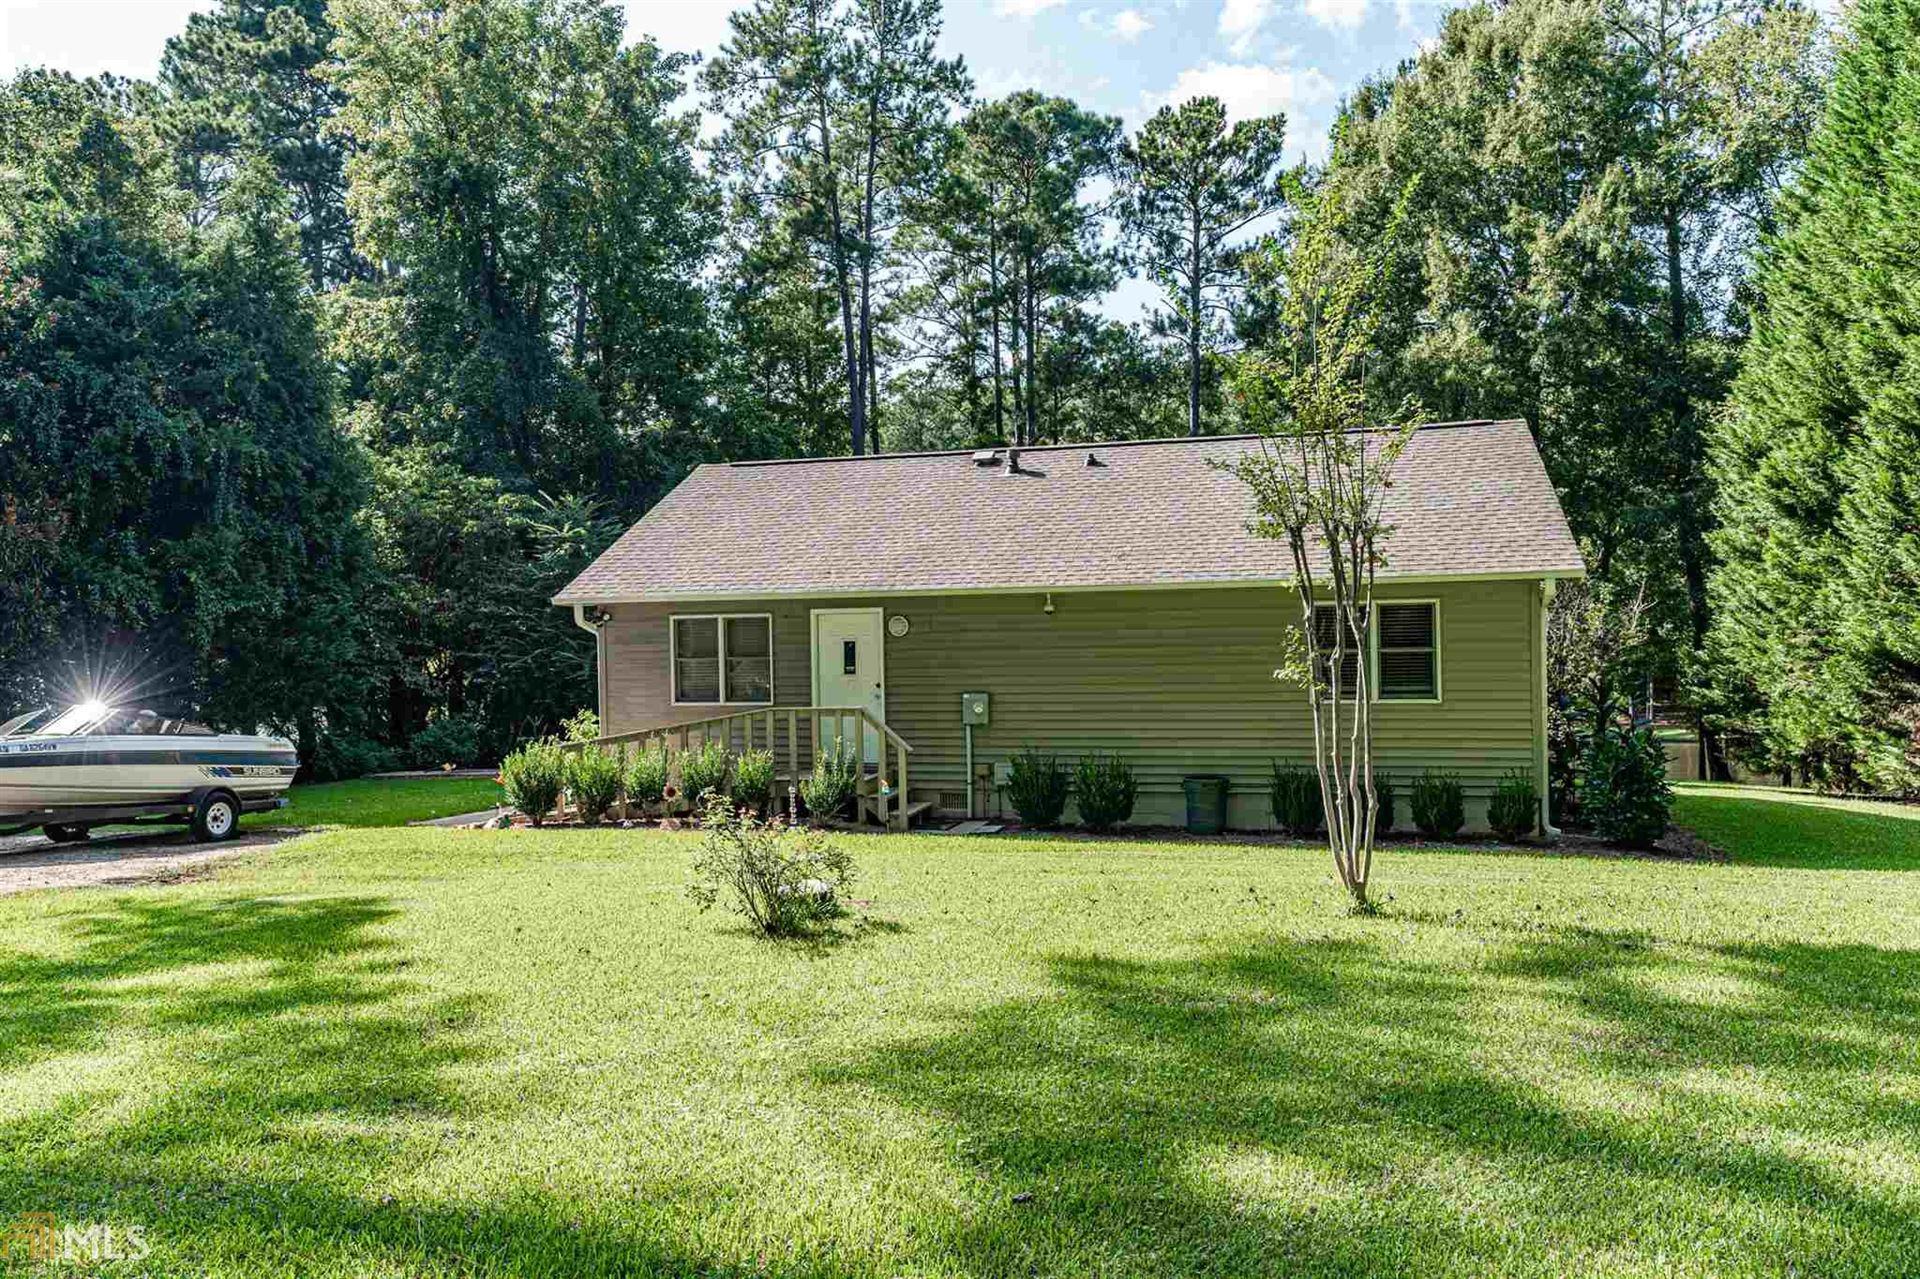 929 Greensboro Rd, Eatonton, GA 31024 - MLS#: 8850121